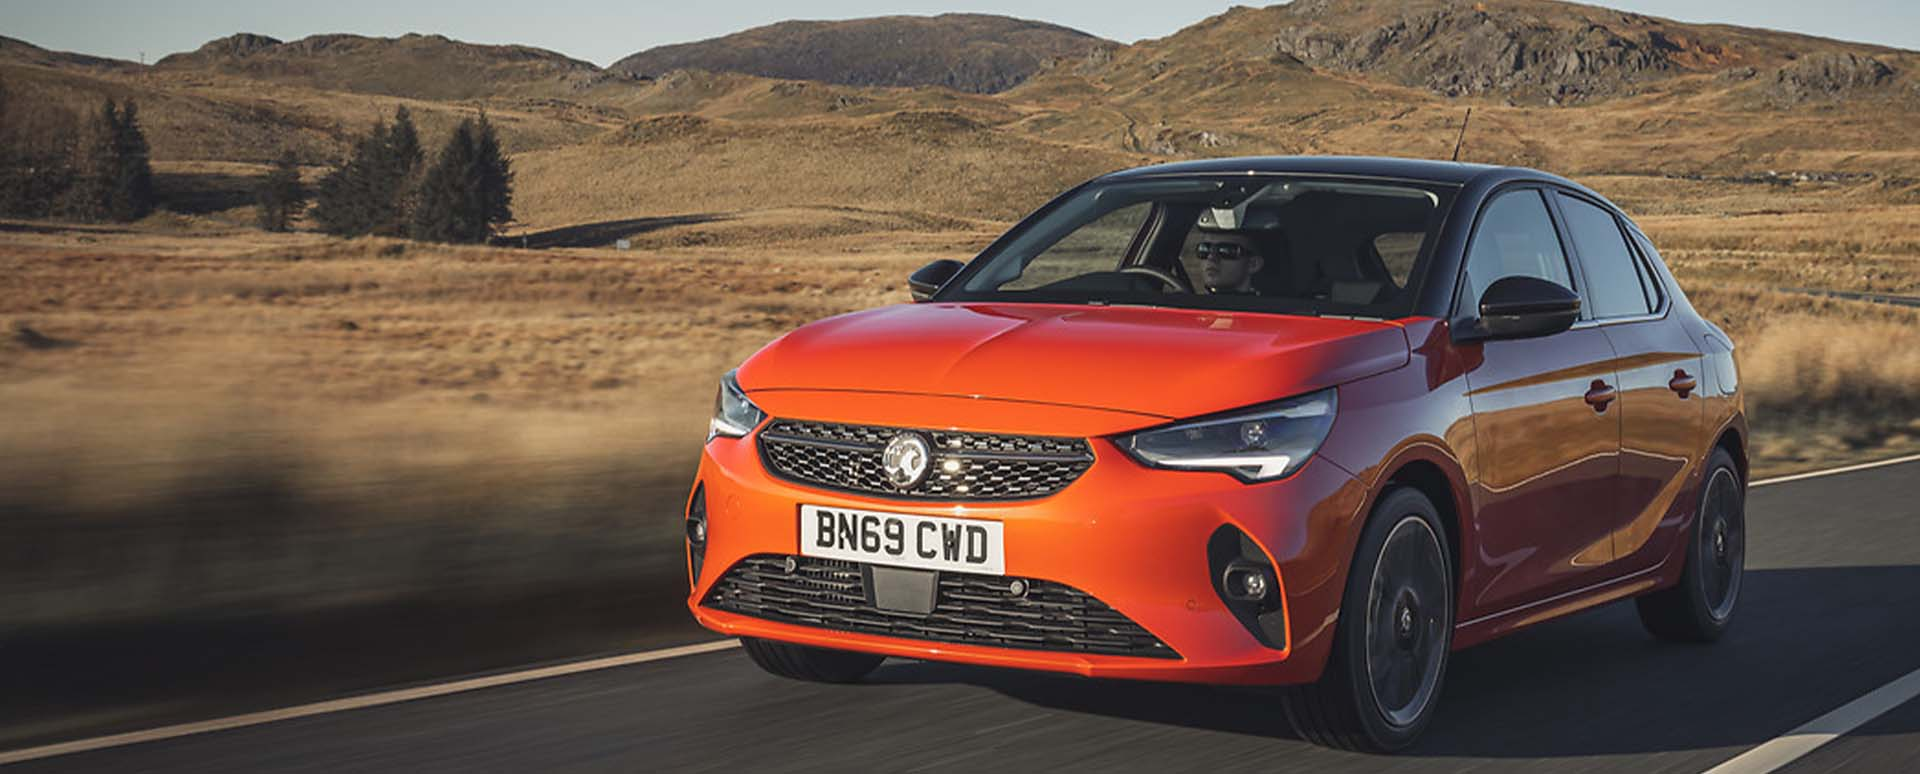 Orange Vauxhall Corsa, driving